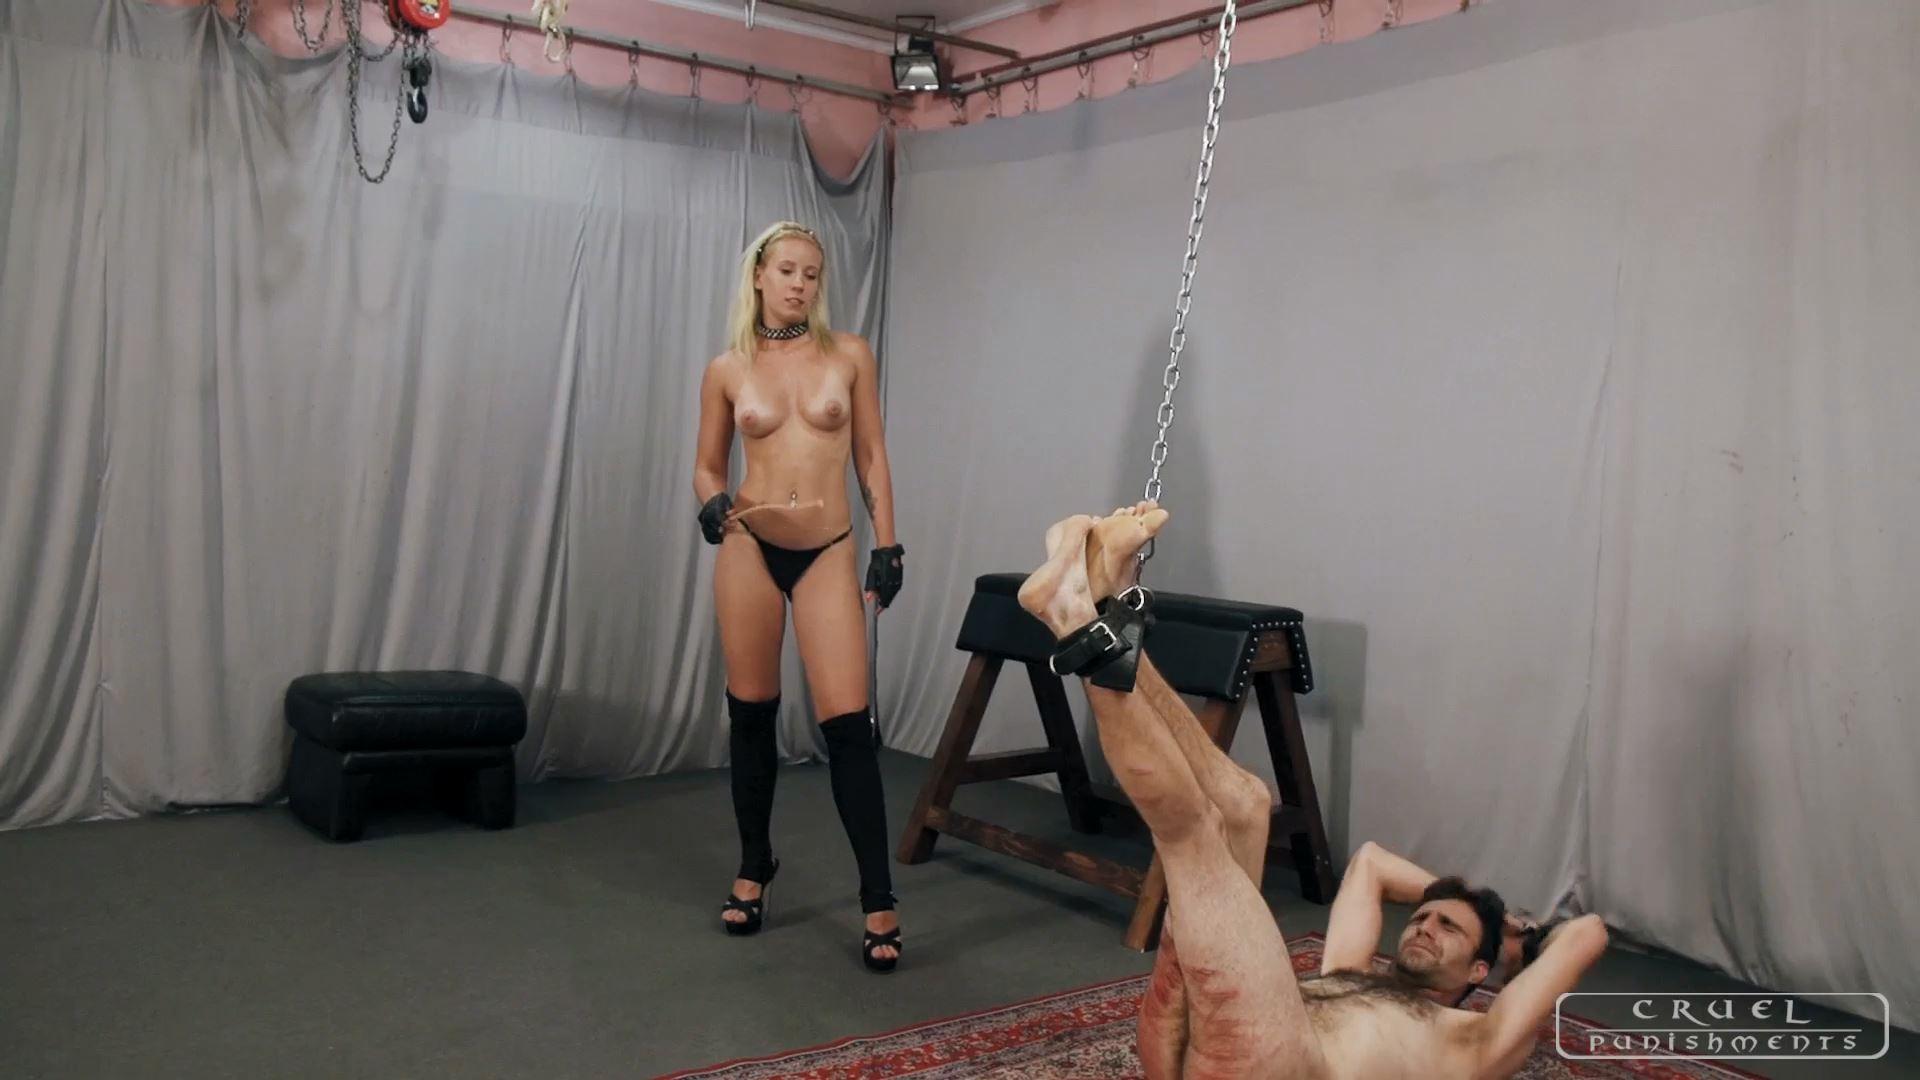 Mistress Anette In Scene: Anette's forceful strokes Part 3 - CRUEL PUNISHMENTS - SEVERE FEMDOM - FULL HD/1080p/MP4